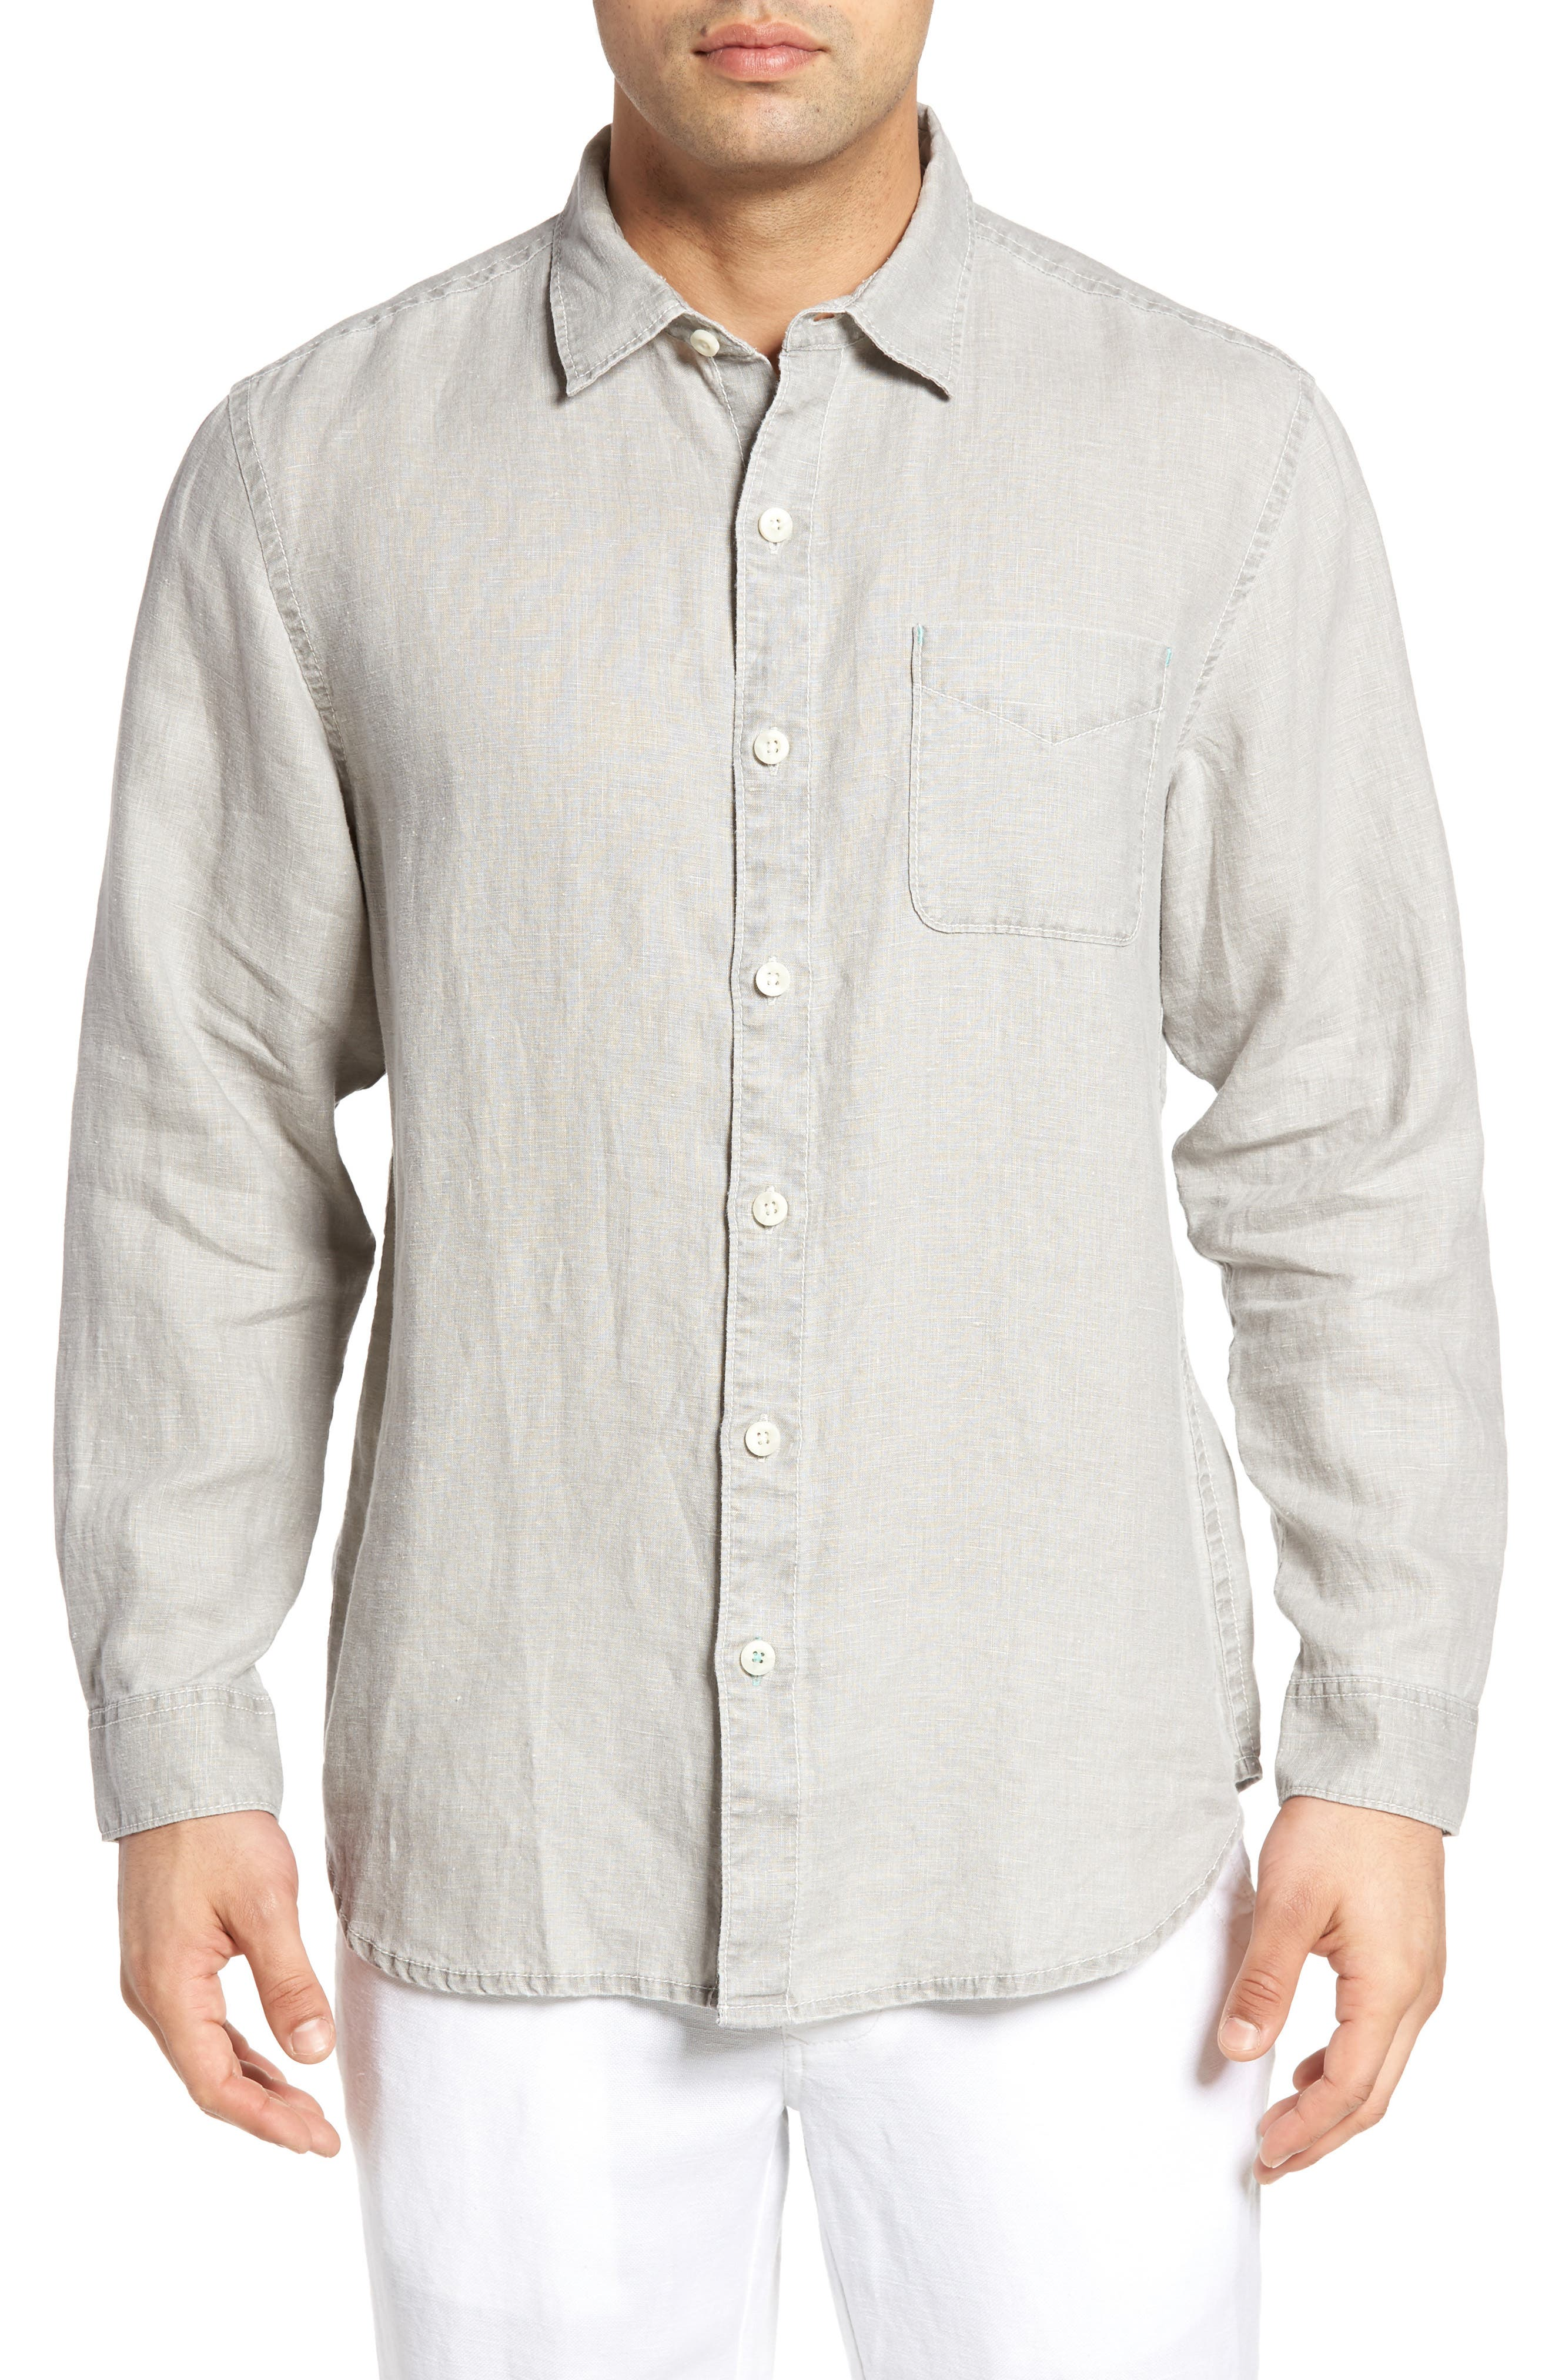 TOMMY BAHAMA, 'Sea Glass Breezer' Original Fit Linen Shirt, Main thumbnail 1, color, LIGHT GREY